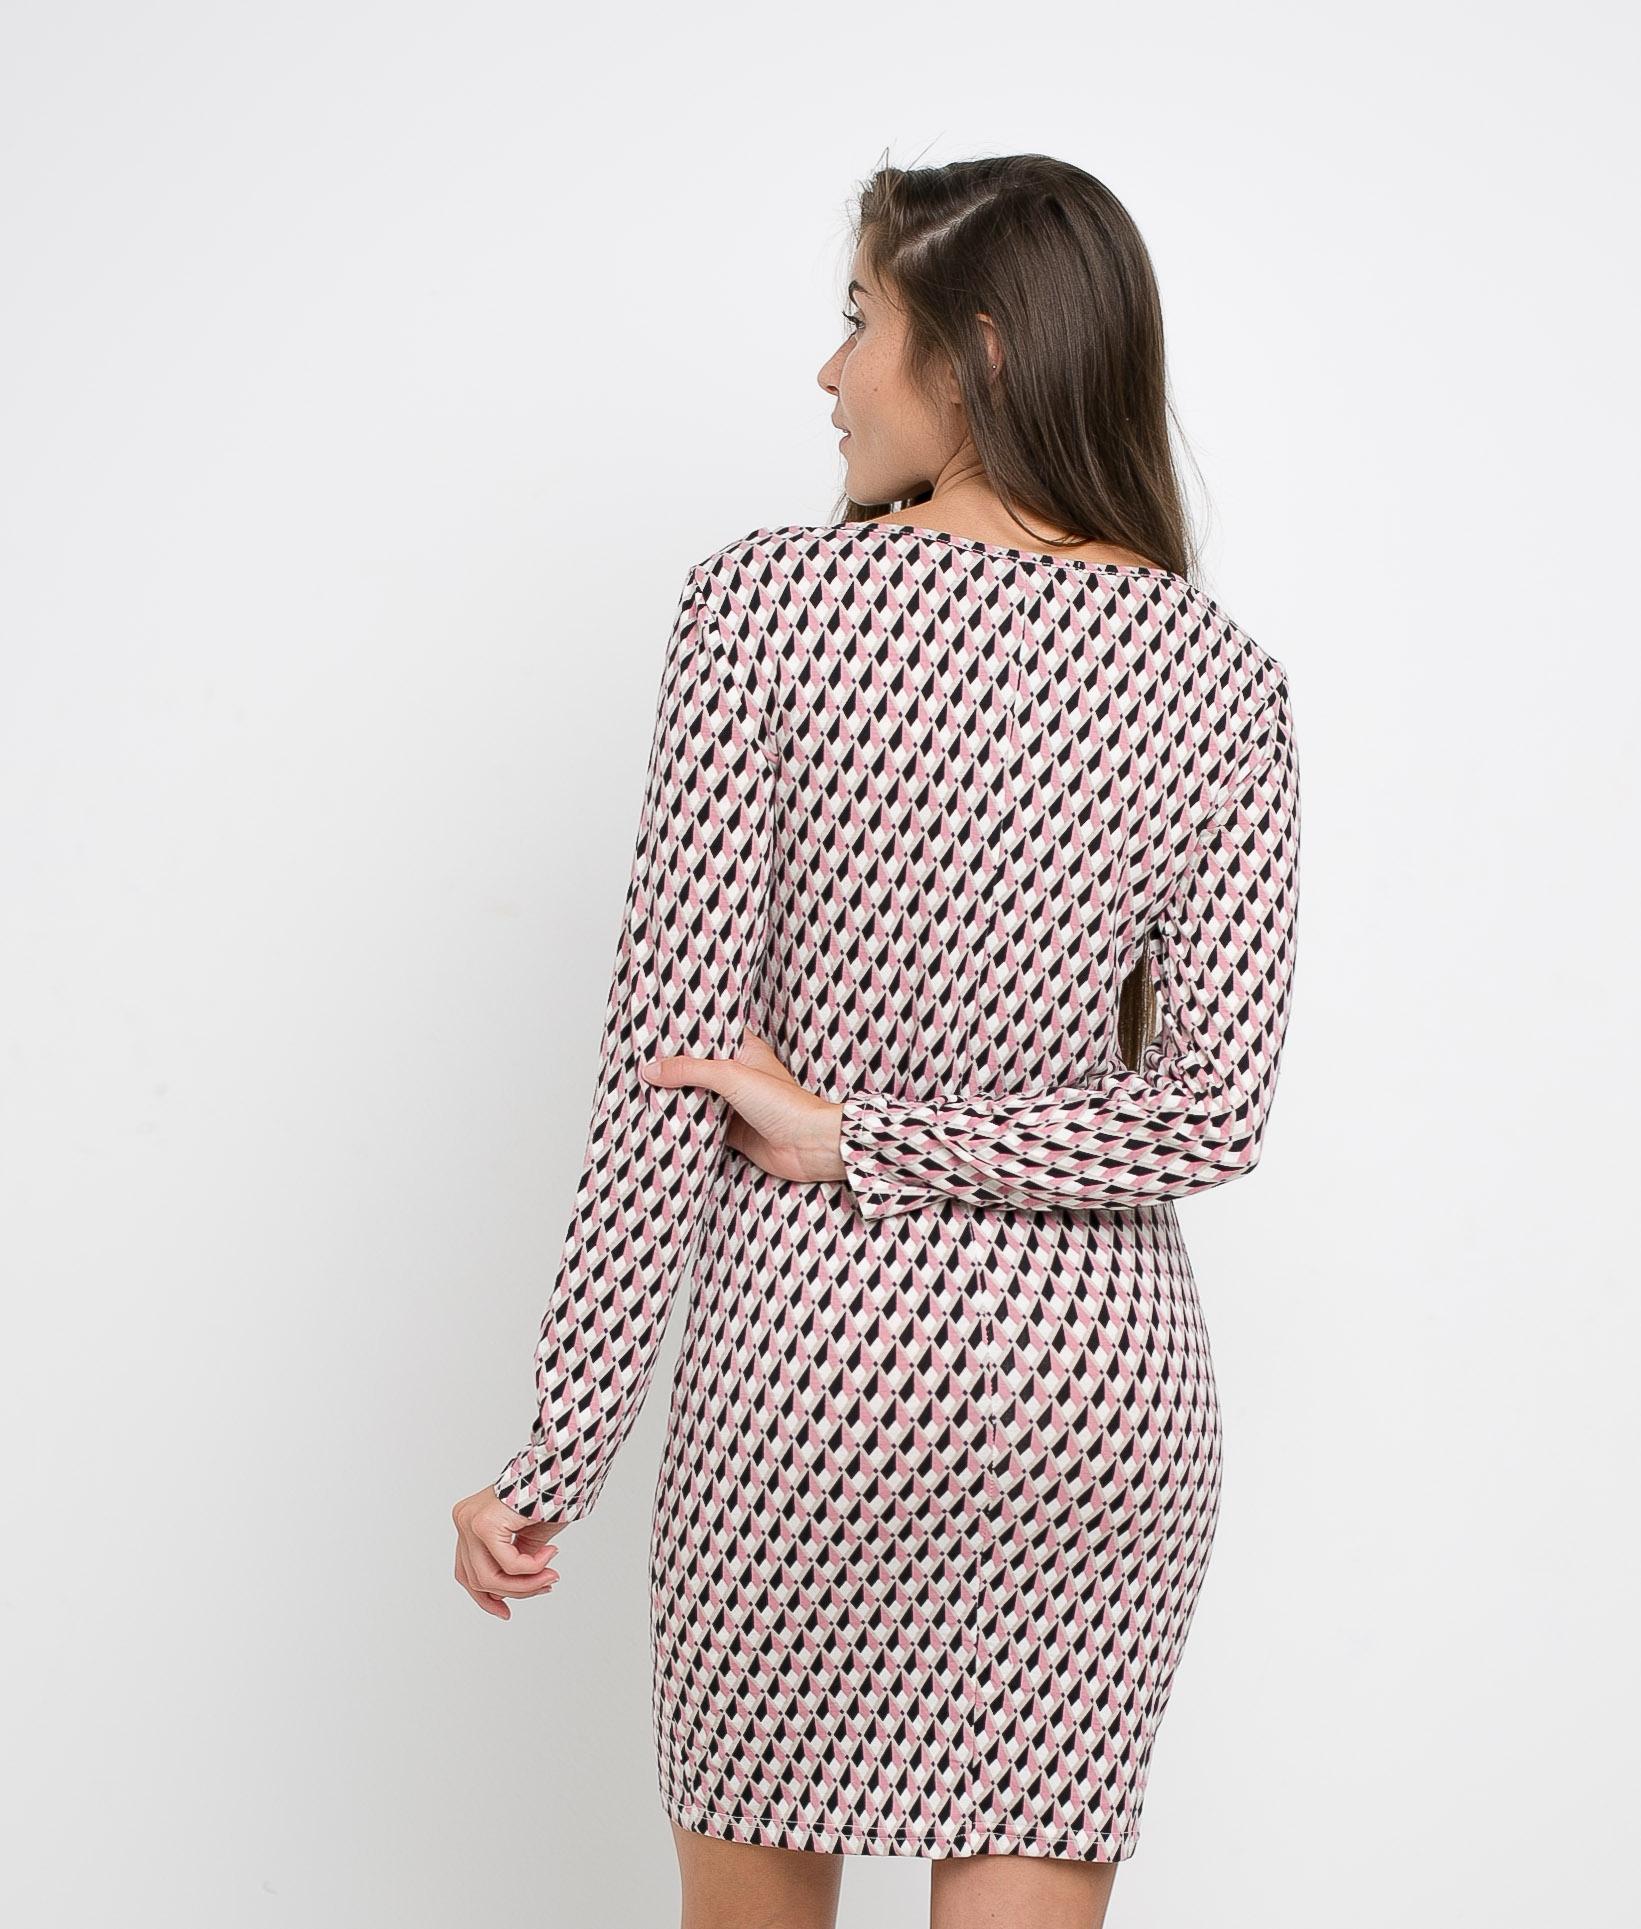 DRESS TRILA - PINK